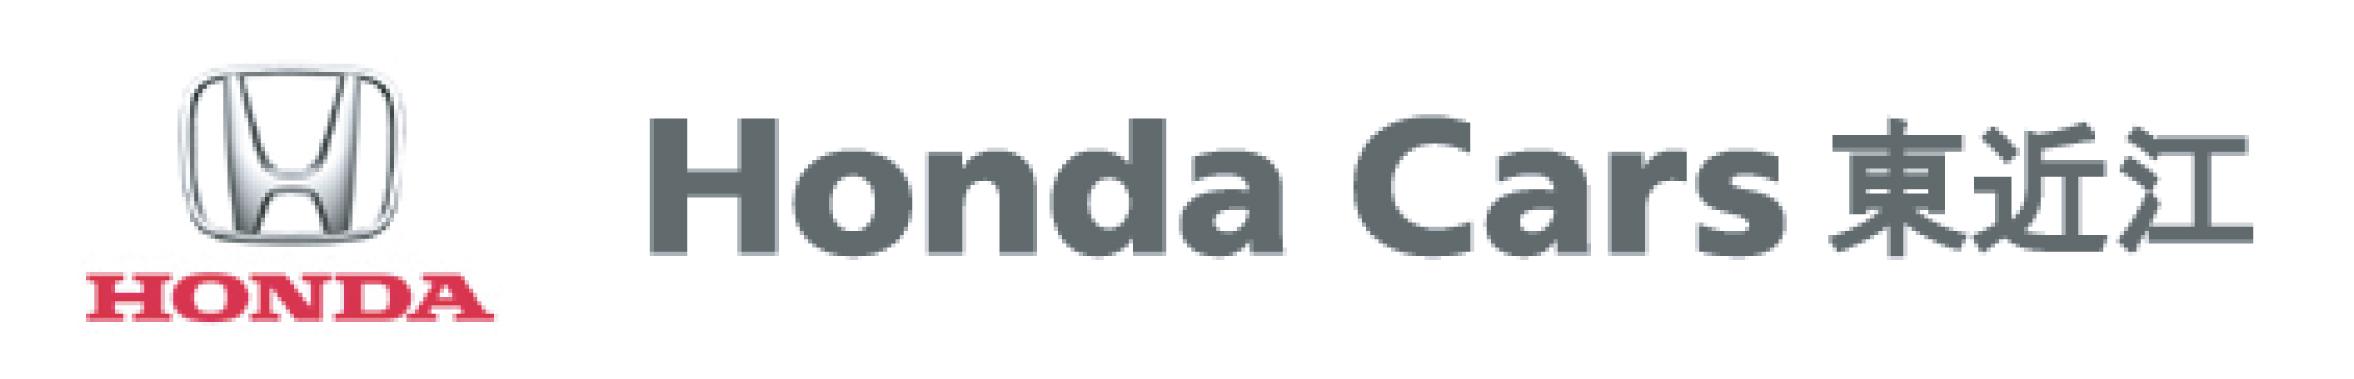 Honda Cars 東近江 web site